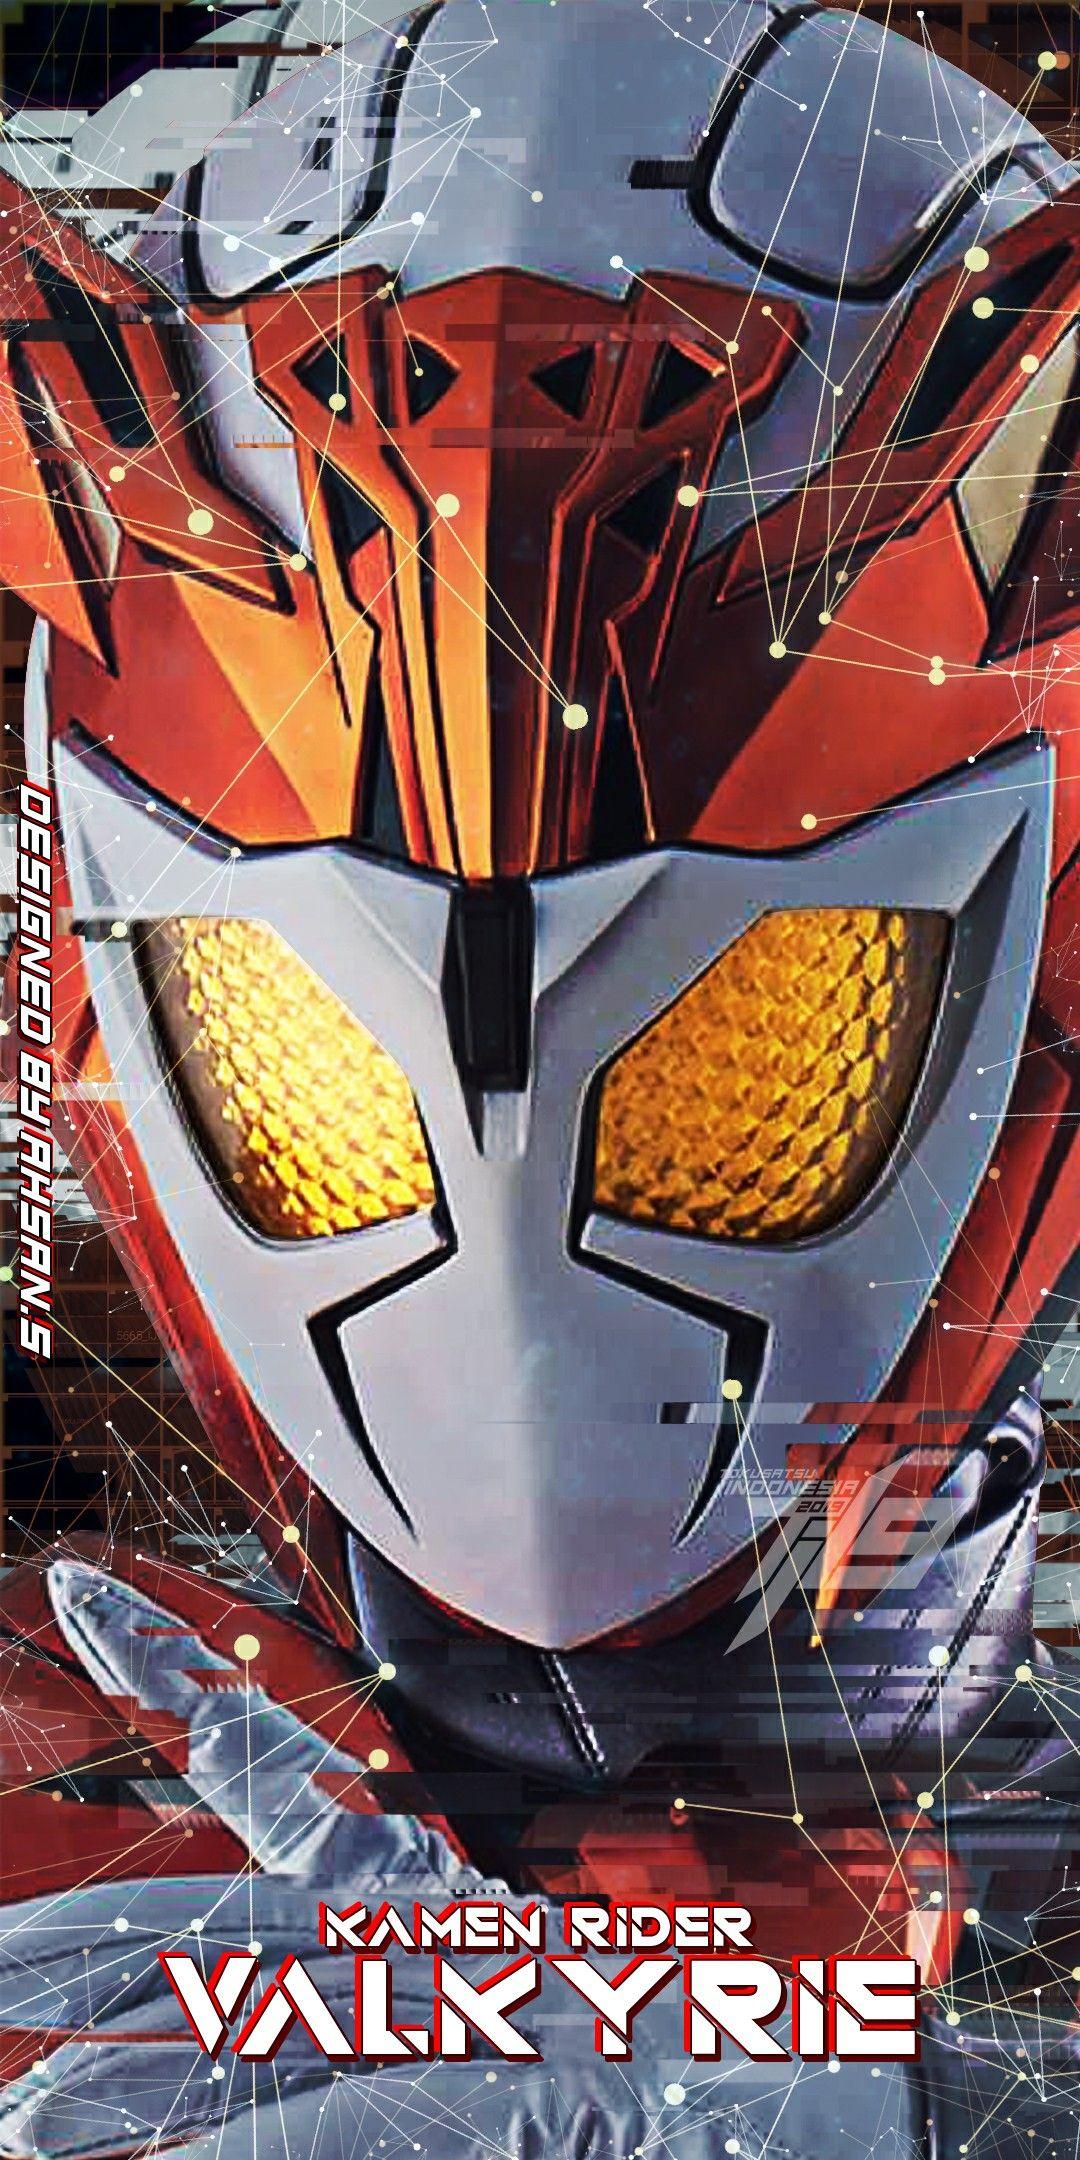 Wallpaper Kamen Rider Era Reiwa Name Kamen Rider Valkyrie Tv